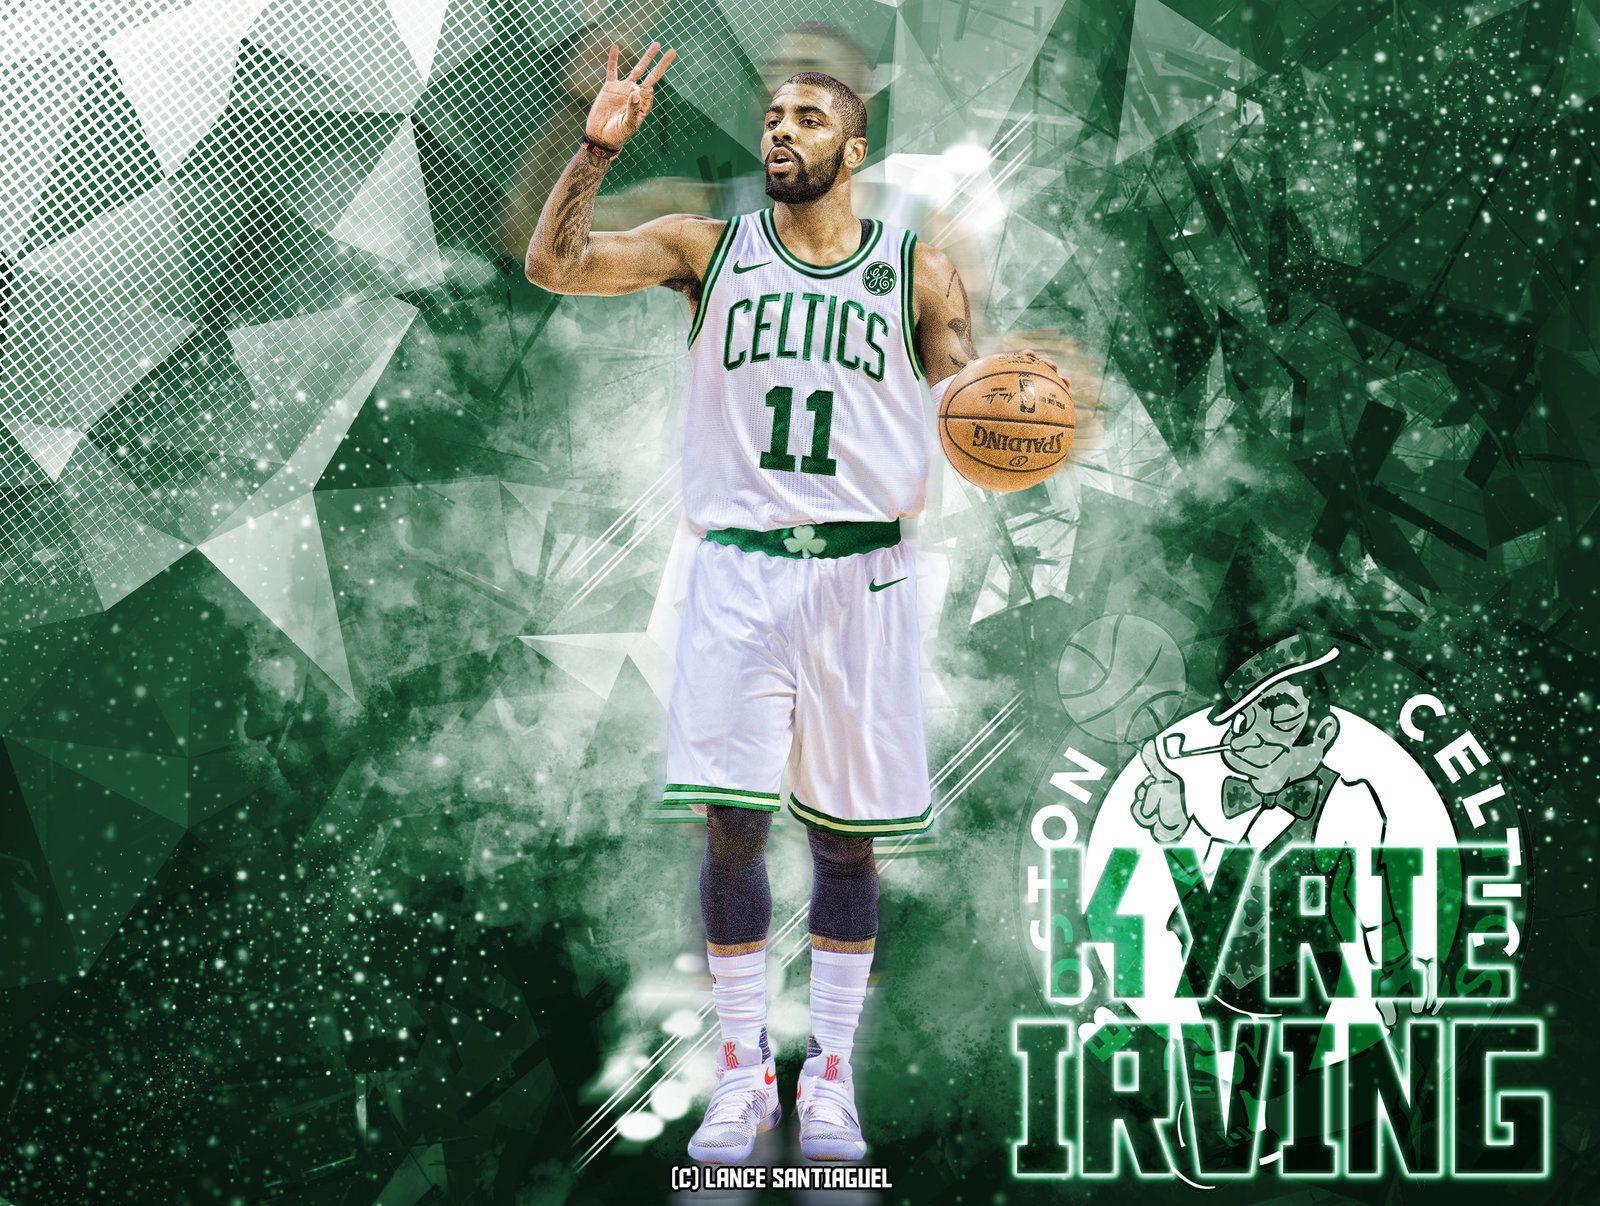 Kyrie Irving to Boston Celtics Fan Art by Lancetastic27 on DeviantArt